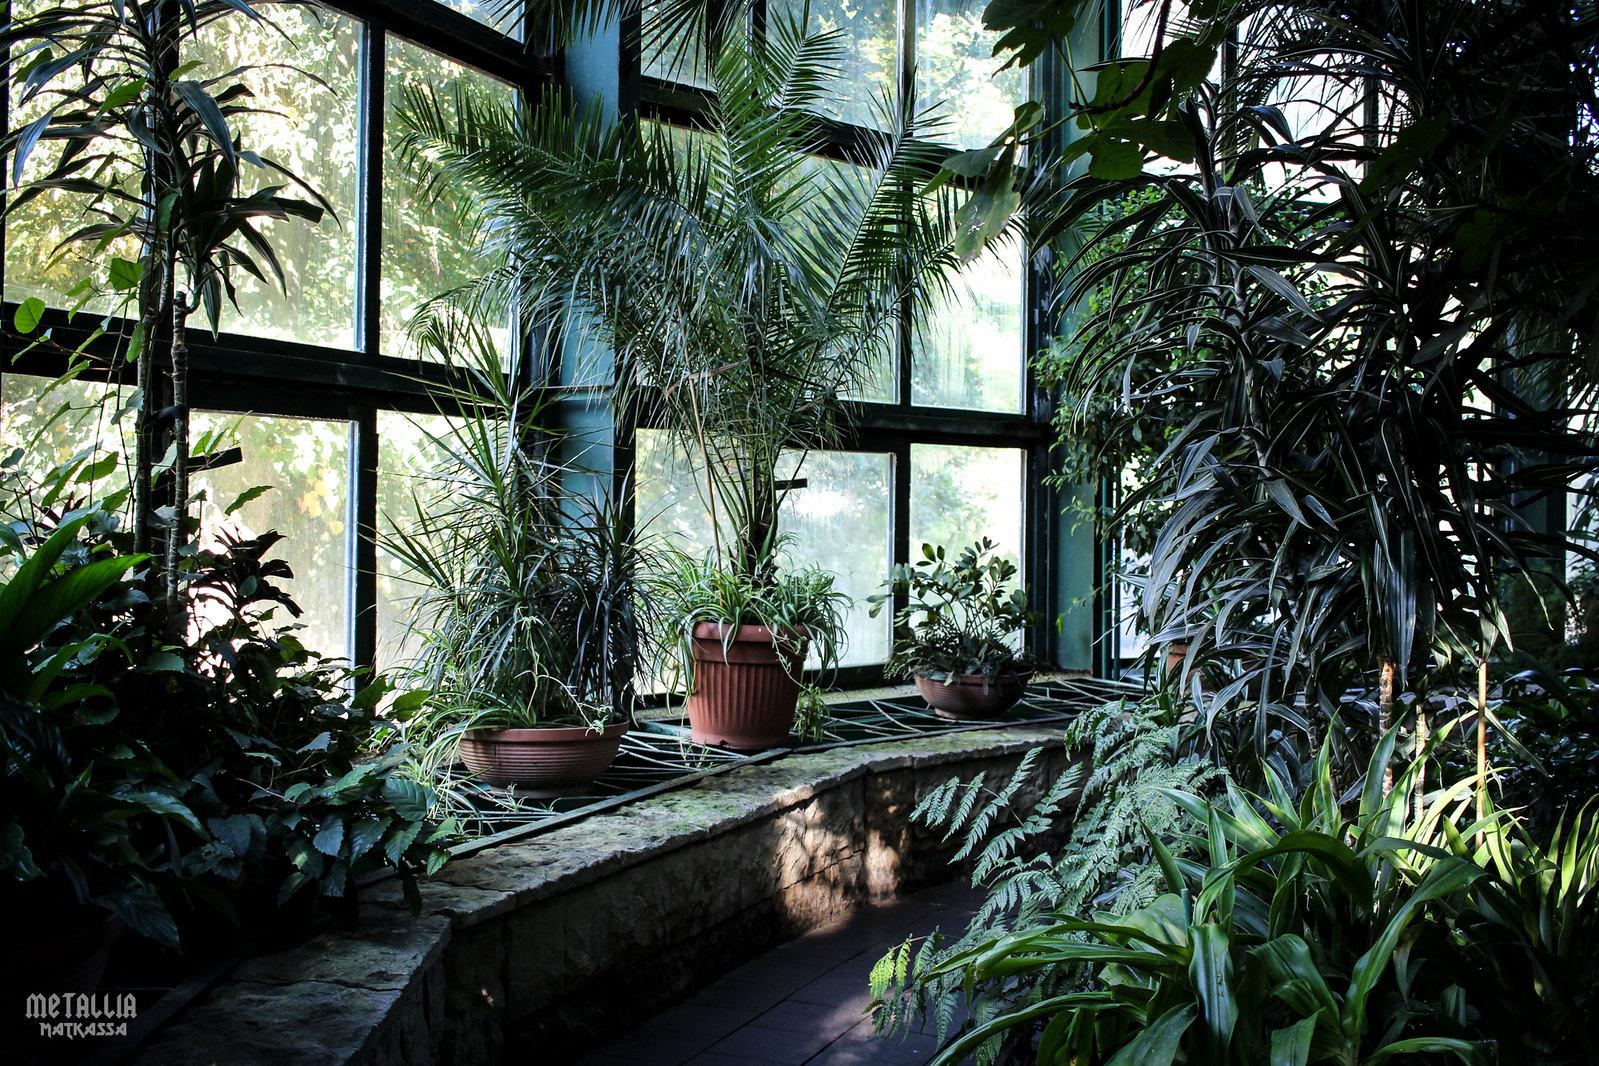 park oliwa, gdansk oliwa, gdanskin nähtävyydet, sightseeing in gdansk, oliwa greenhouse, botanical garden in gdansk